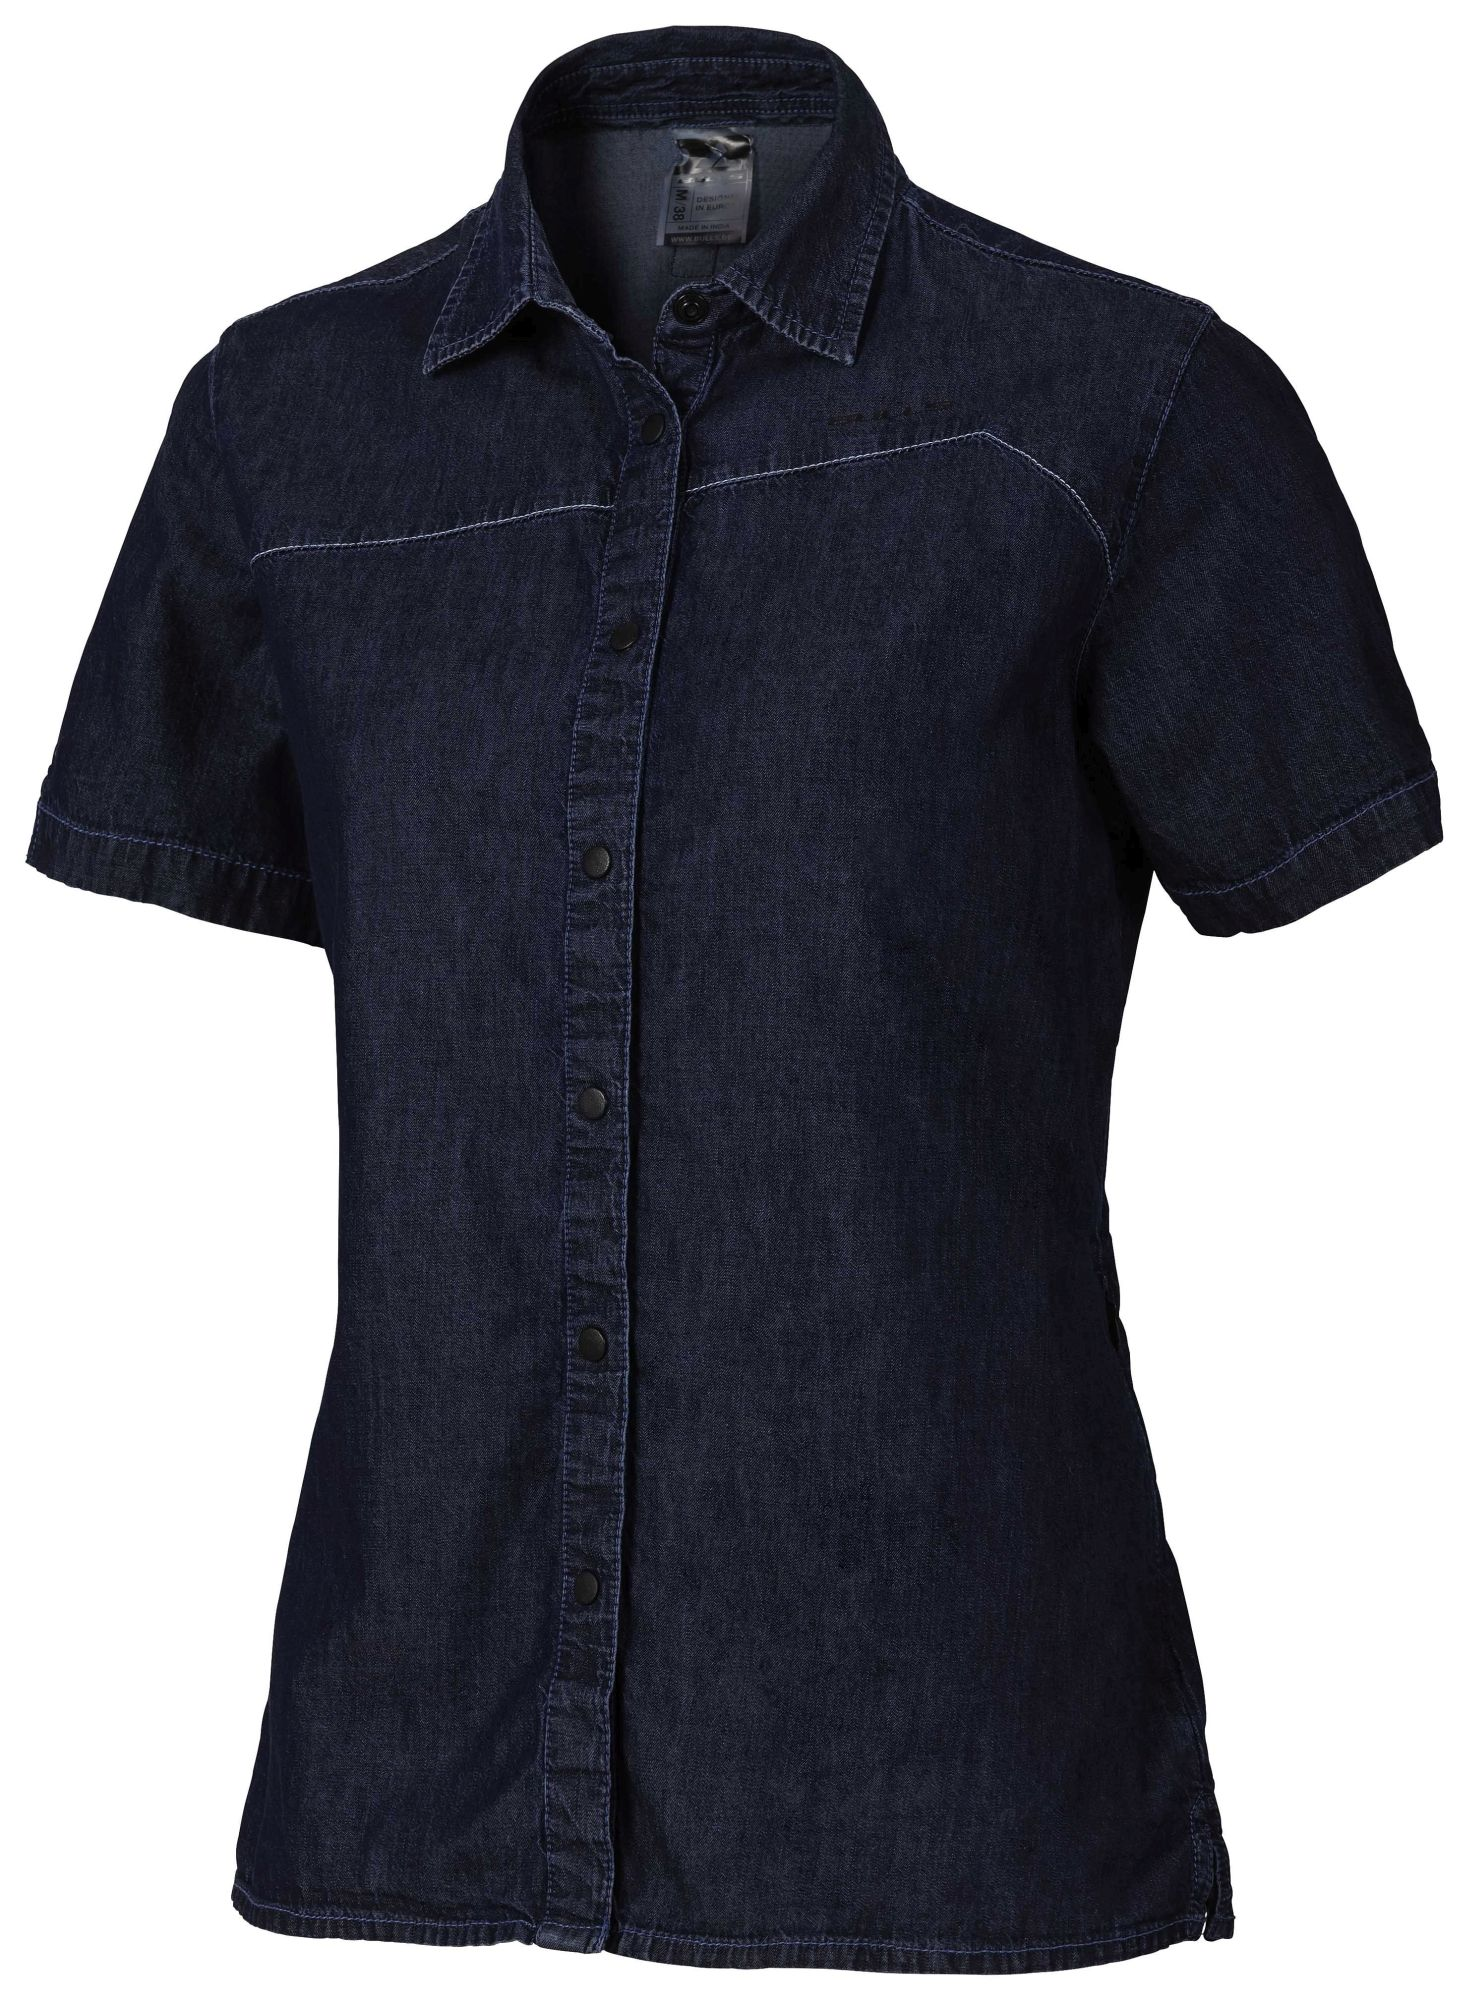 Bulls Workwear Damen kurzarm Bluse XL denim